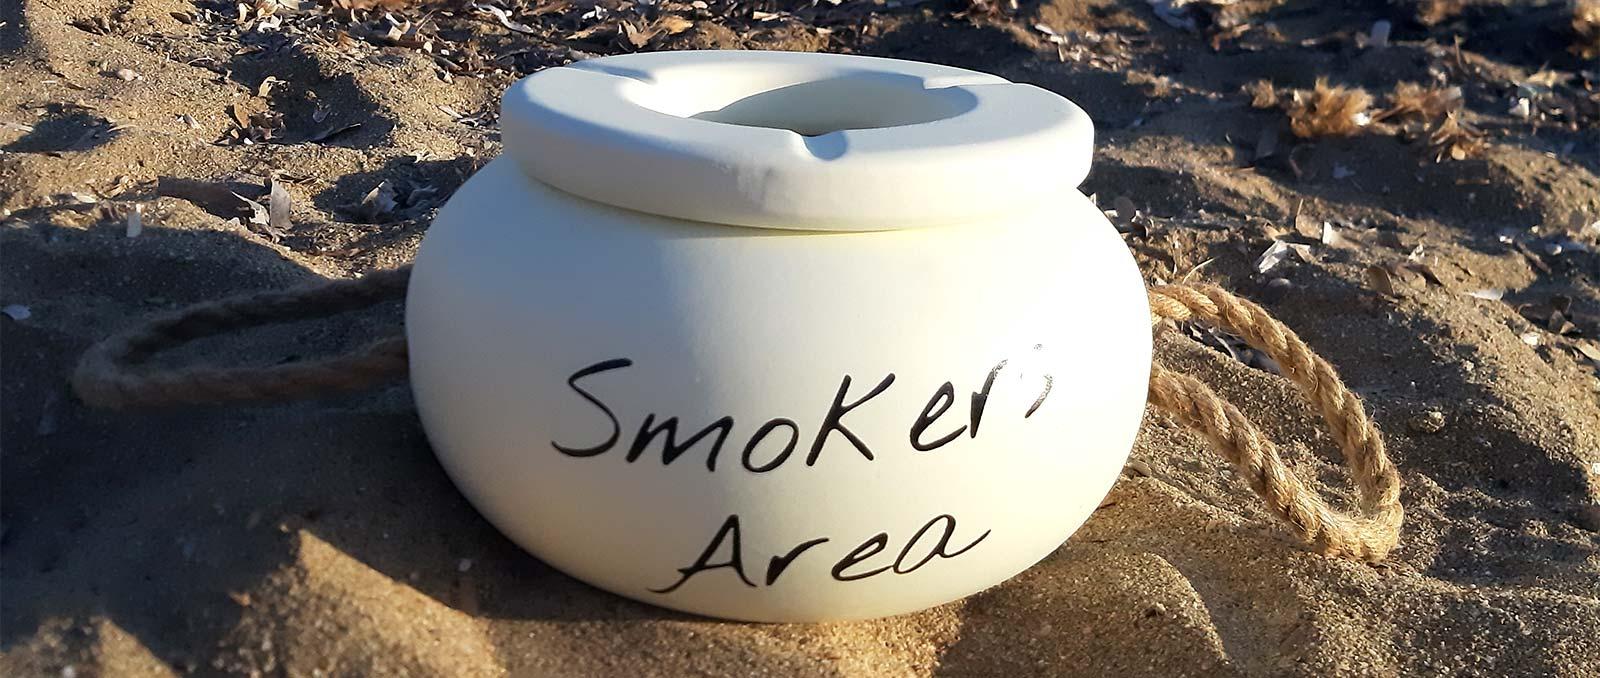 tasaki-keramiko-megalo